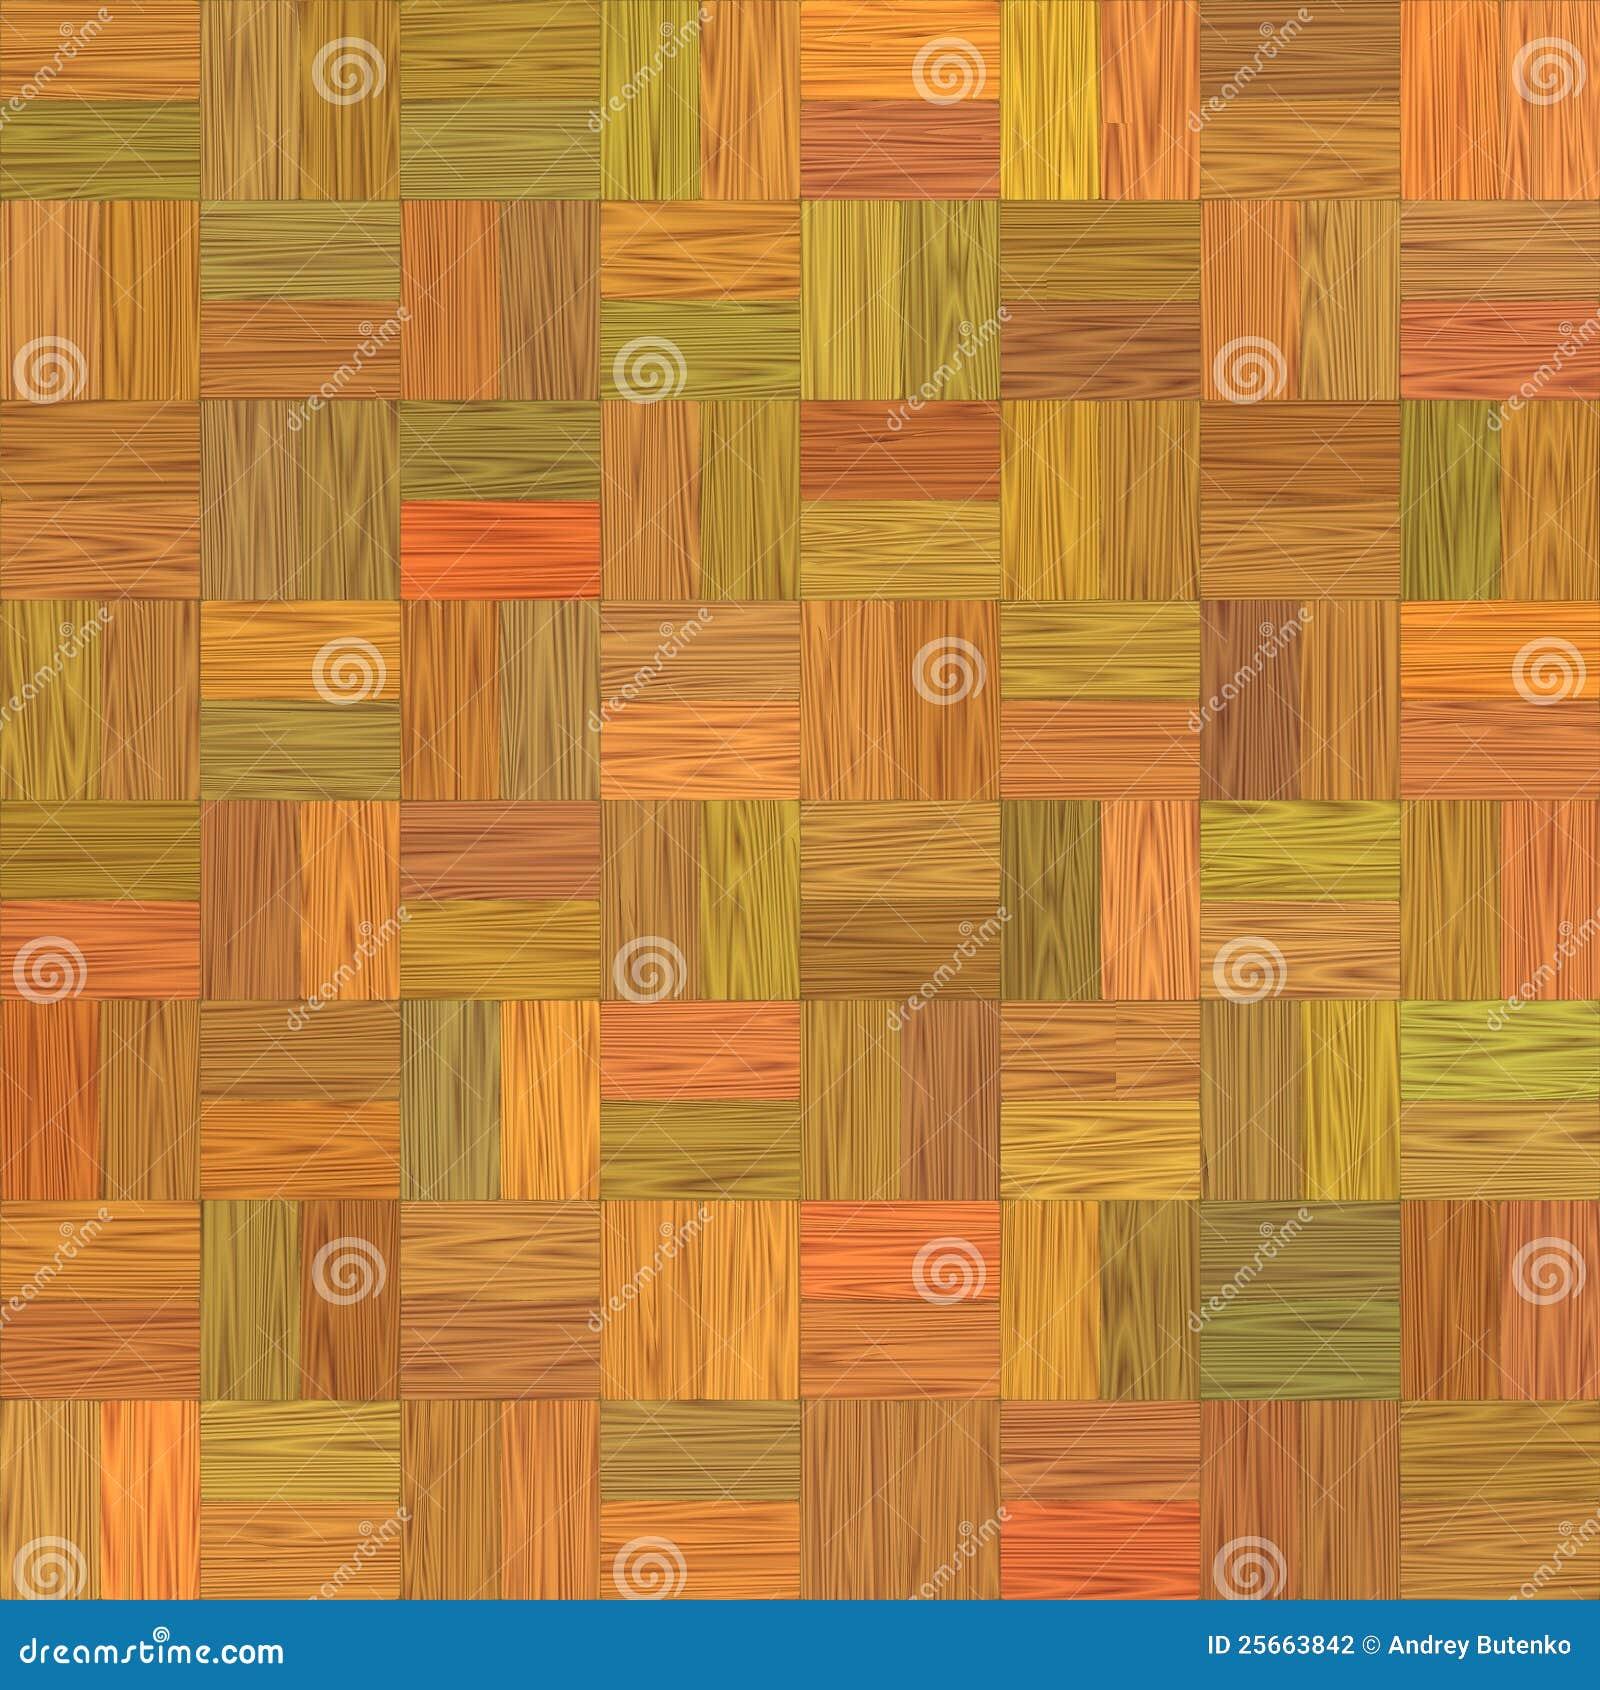 multicolor parquet stock photography image 25663842. Black Bedroom Furniture Sets. Home Design Ideas